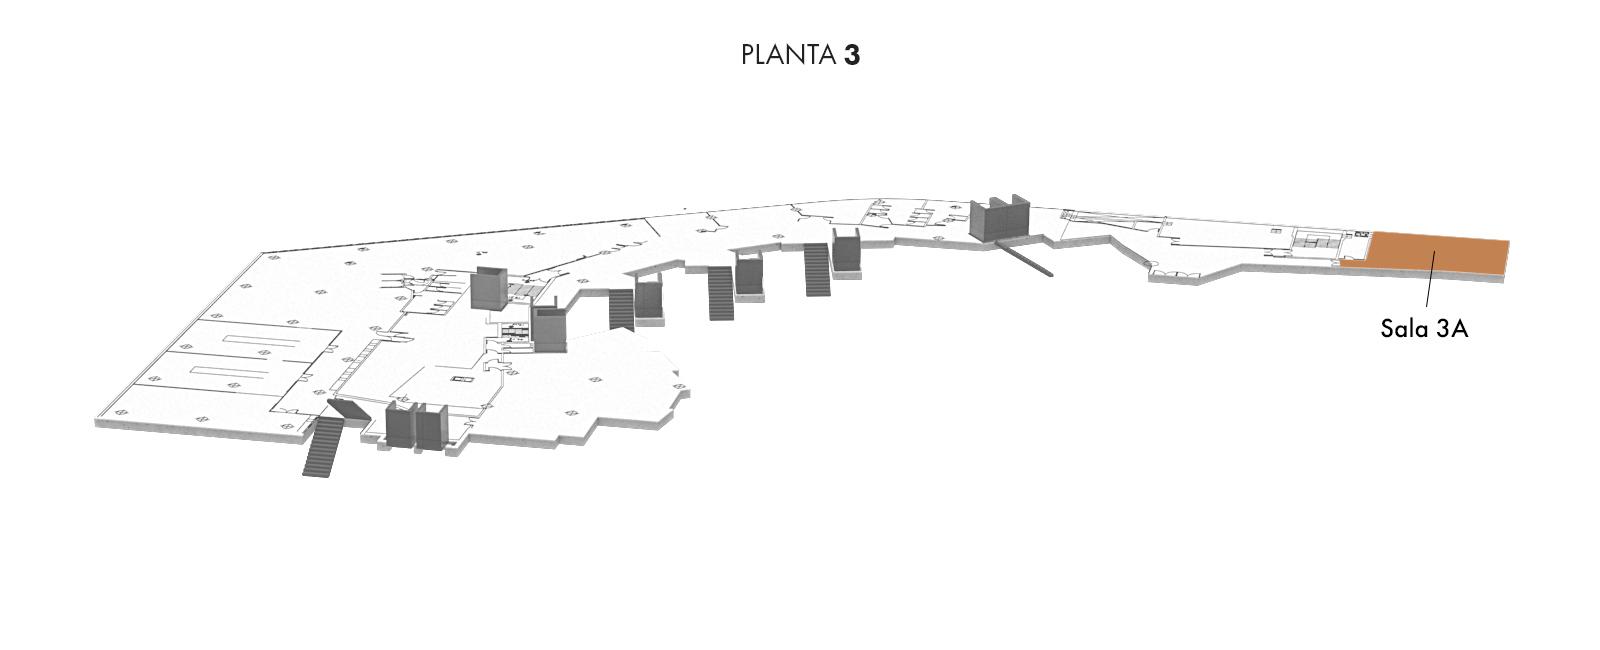 Sala 3A, Planta 3 | Palacio Euskalduna Jauregia